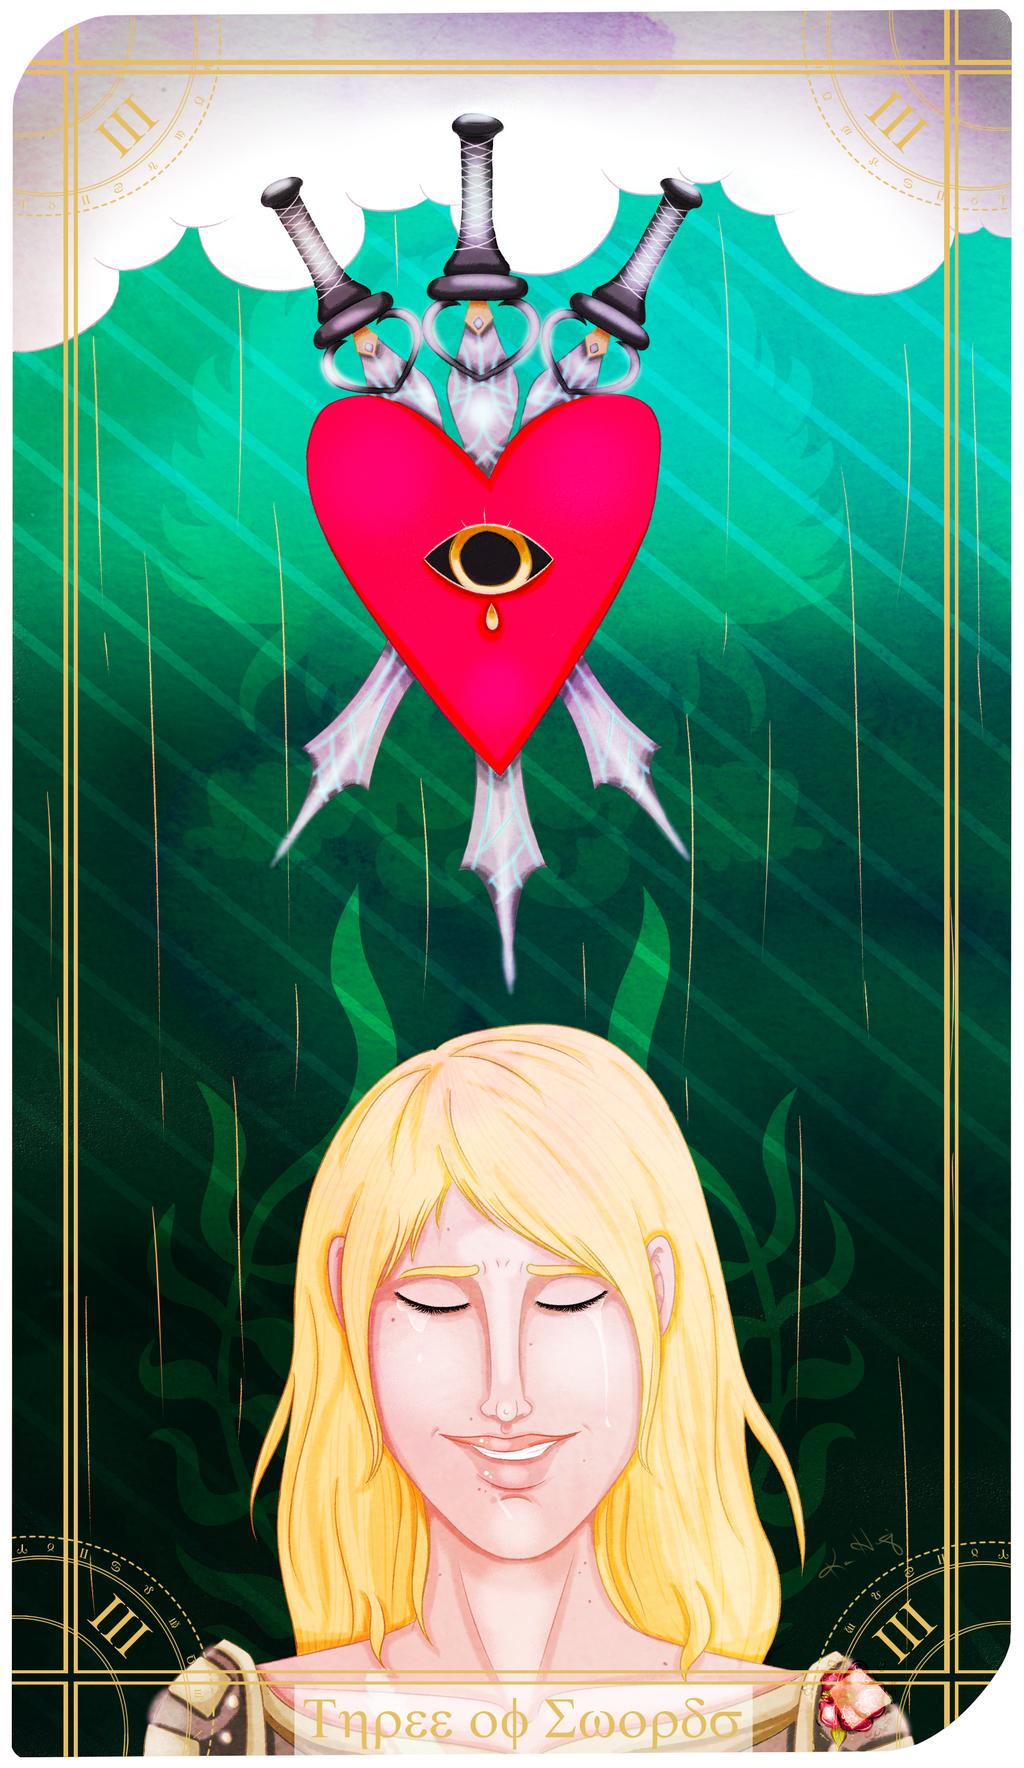 Drawlloween '20 - #23 Tarot Card